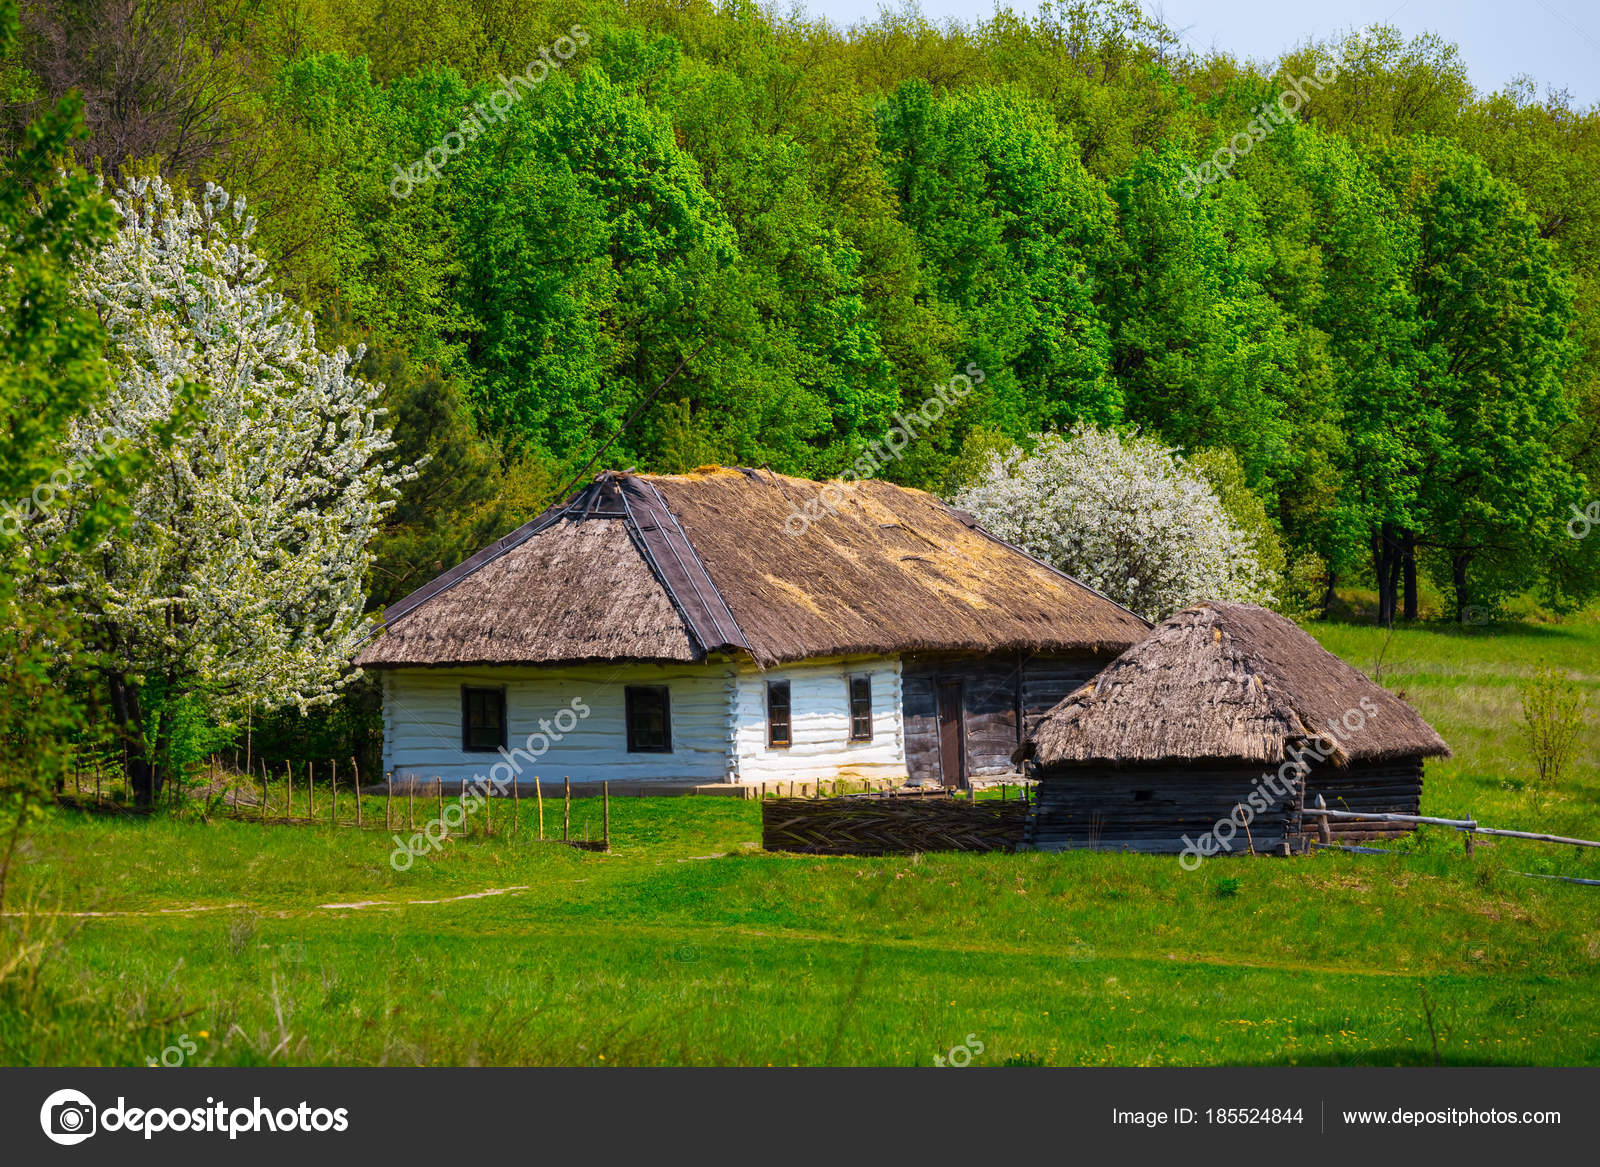 Pequena casa rural tnica jardim fotografias de stock for Casa rural mansion terraplen seis